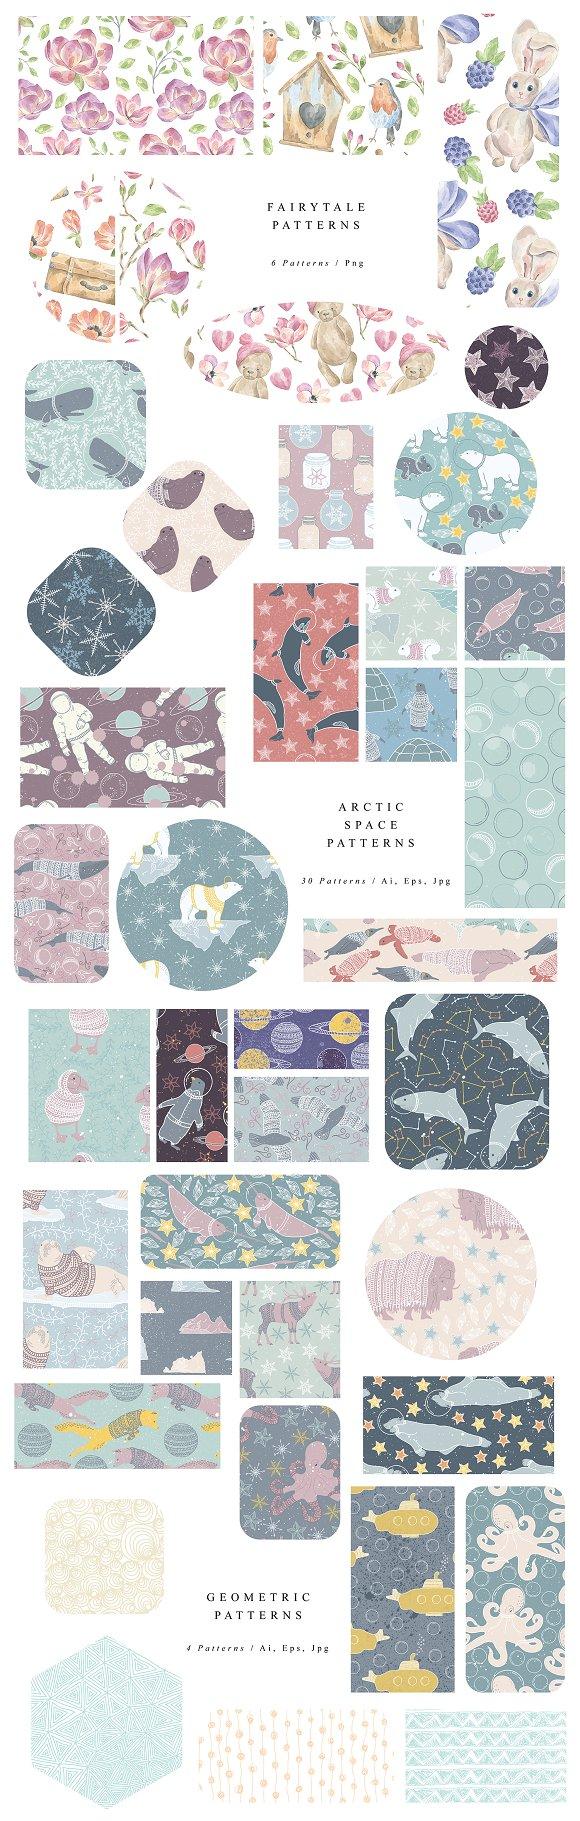 1805 Patterns Bundle Graphic Patterns Creative Market